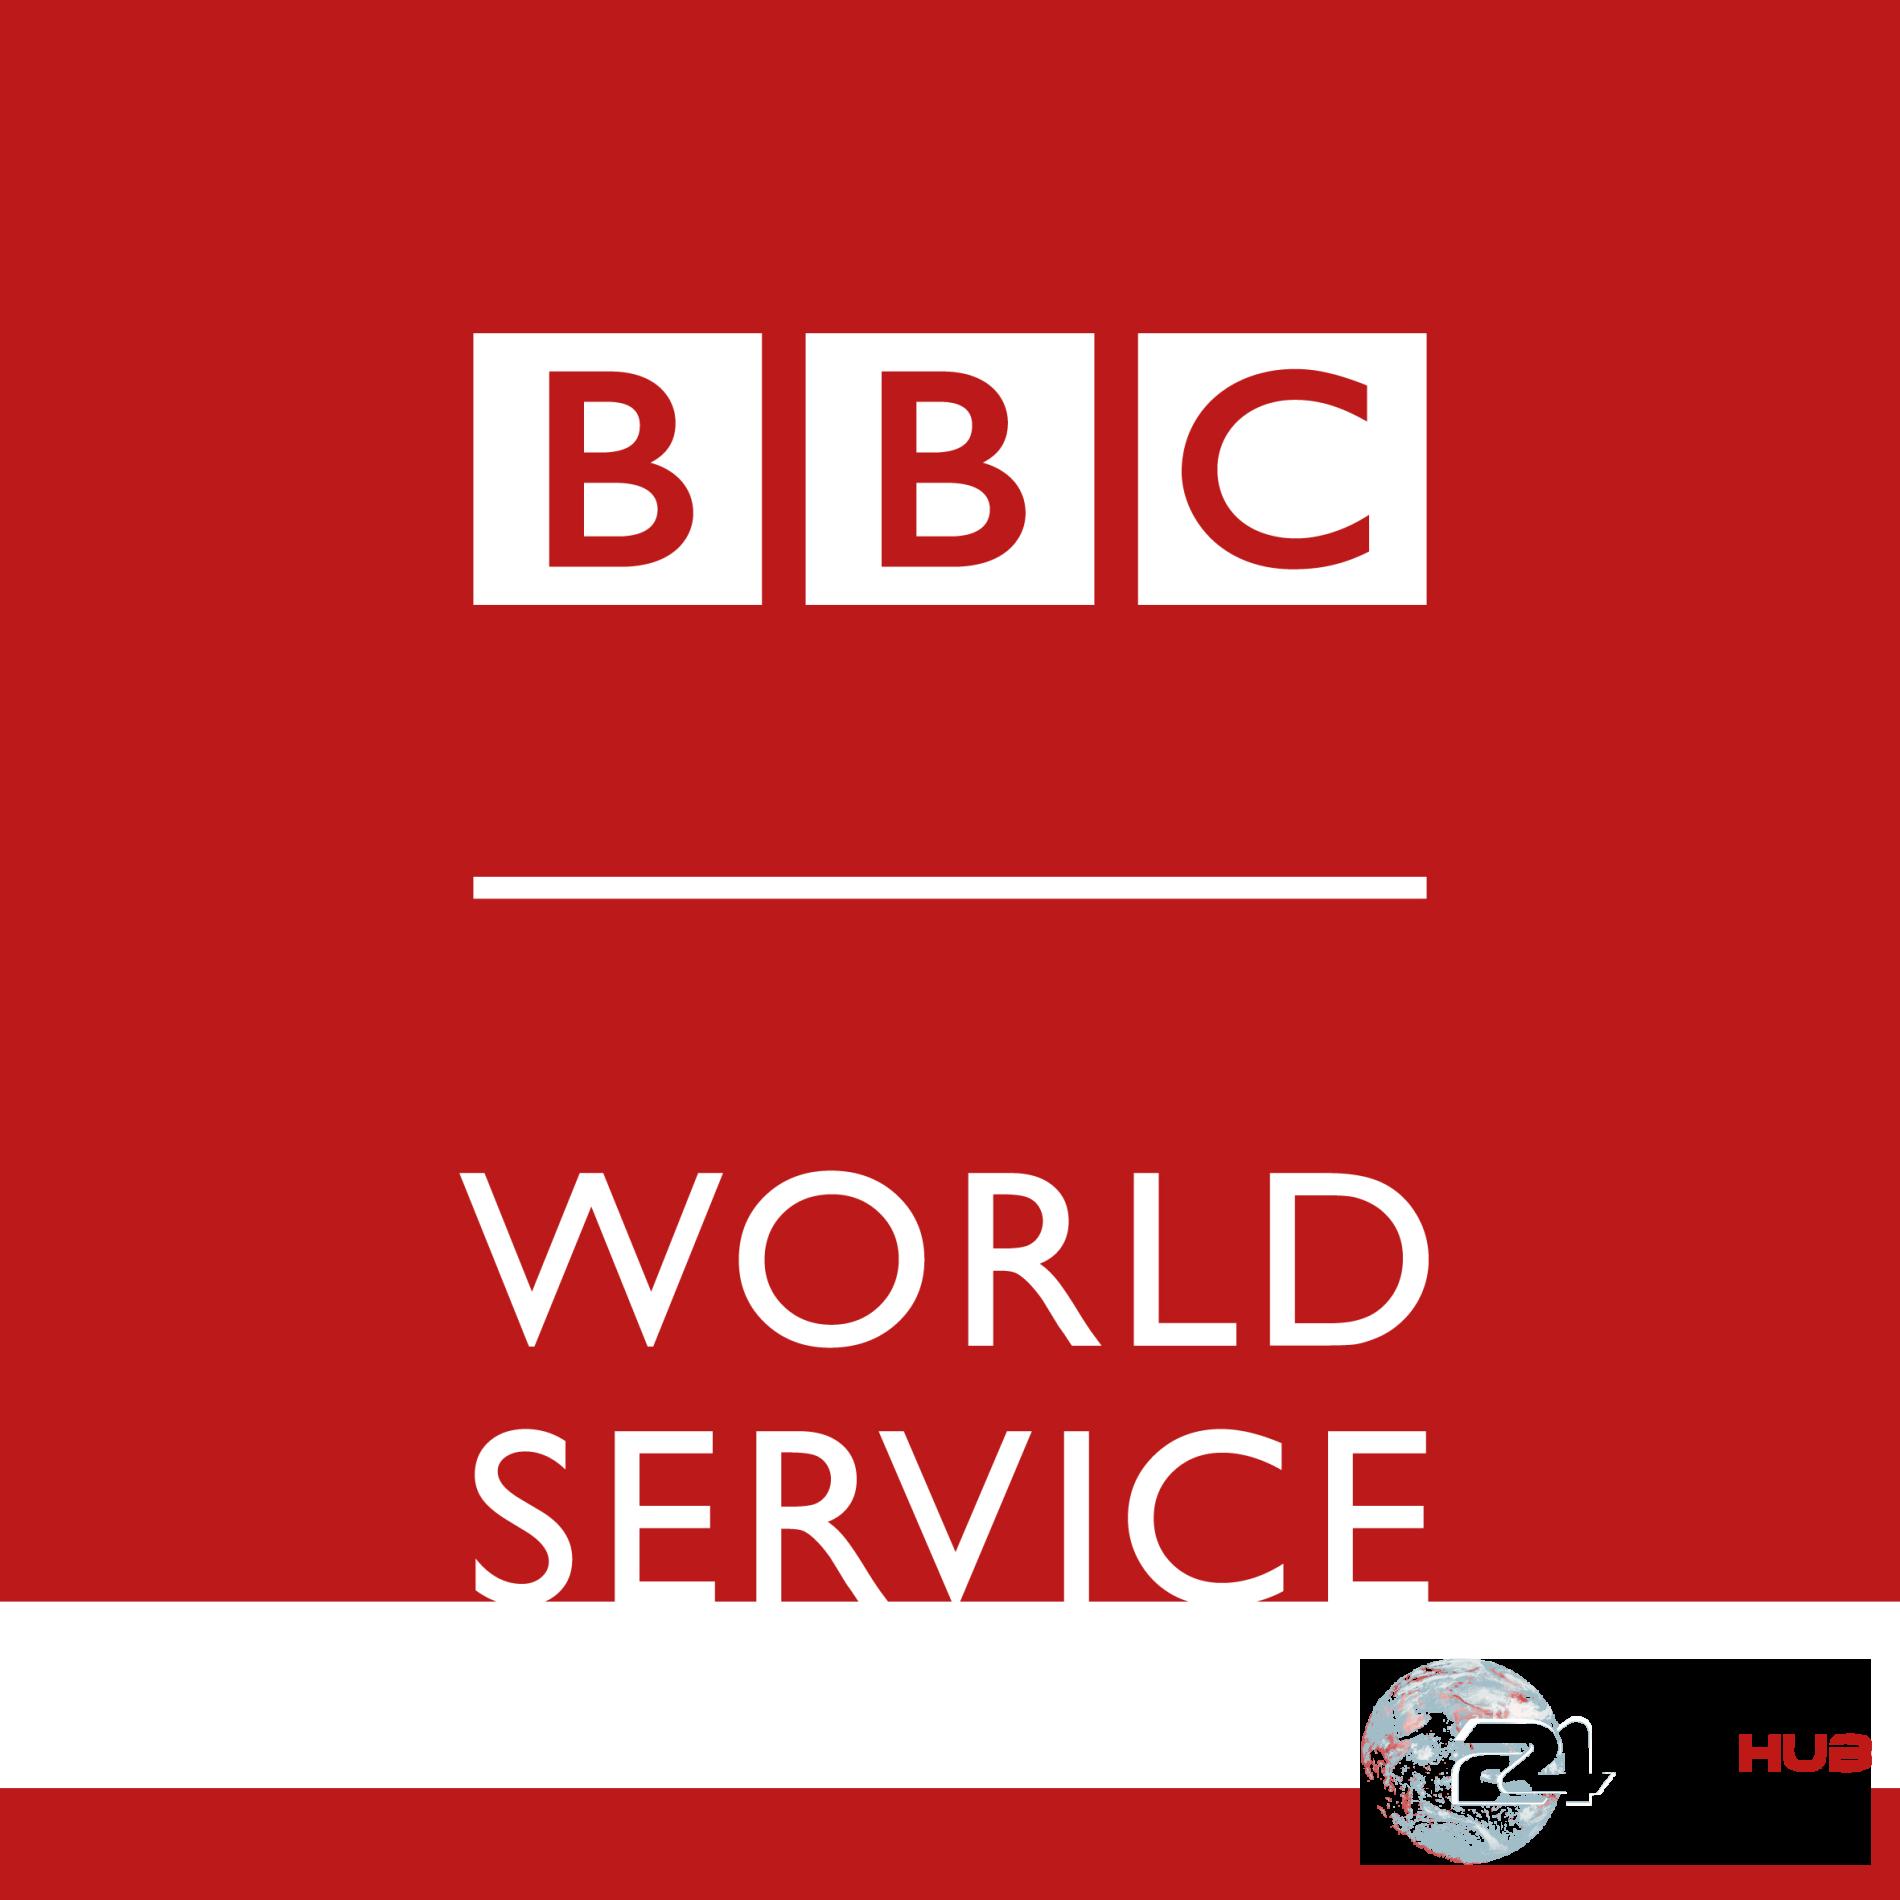 Hiring || BBC World Service Jobs Vacancies in Nigeria | 3 Positions